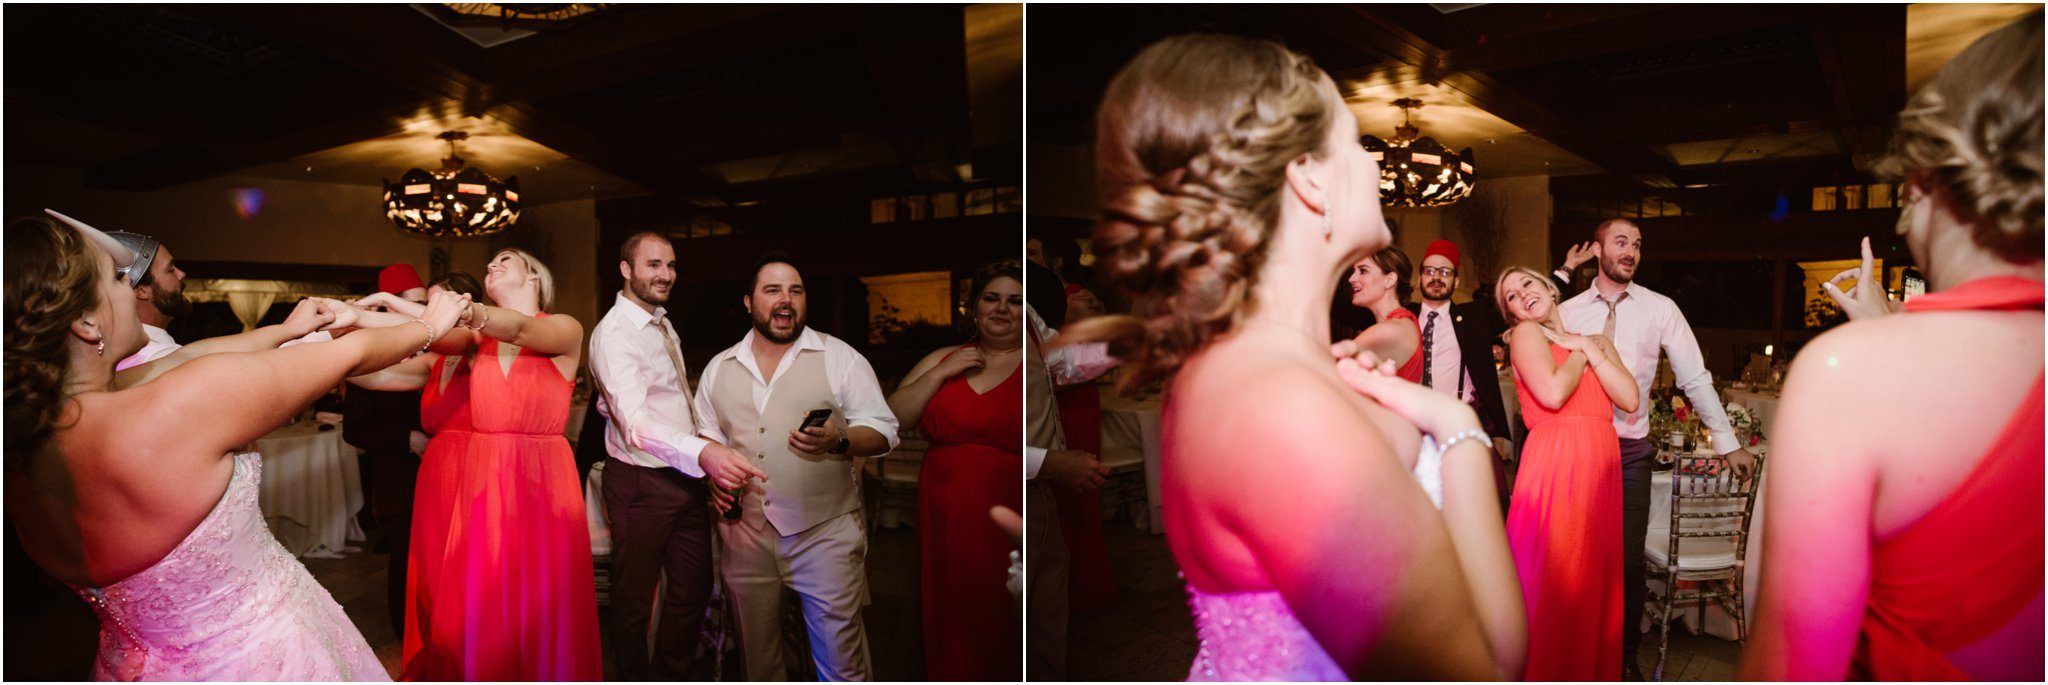 0097albuquerque-wedding-photographer_-santa-fe-wedding-photographer_-southwest-wedding-photography_-blue-rose-studio